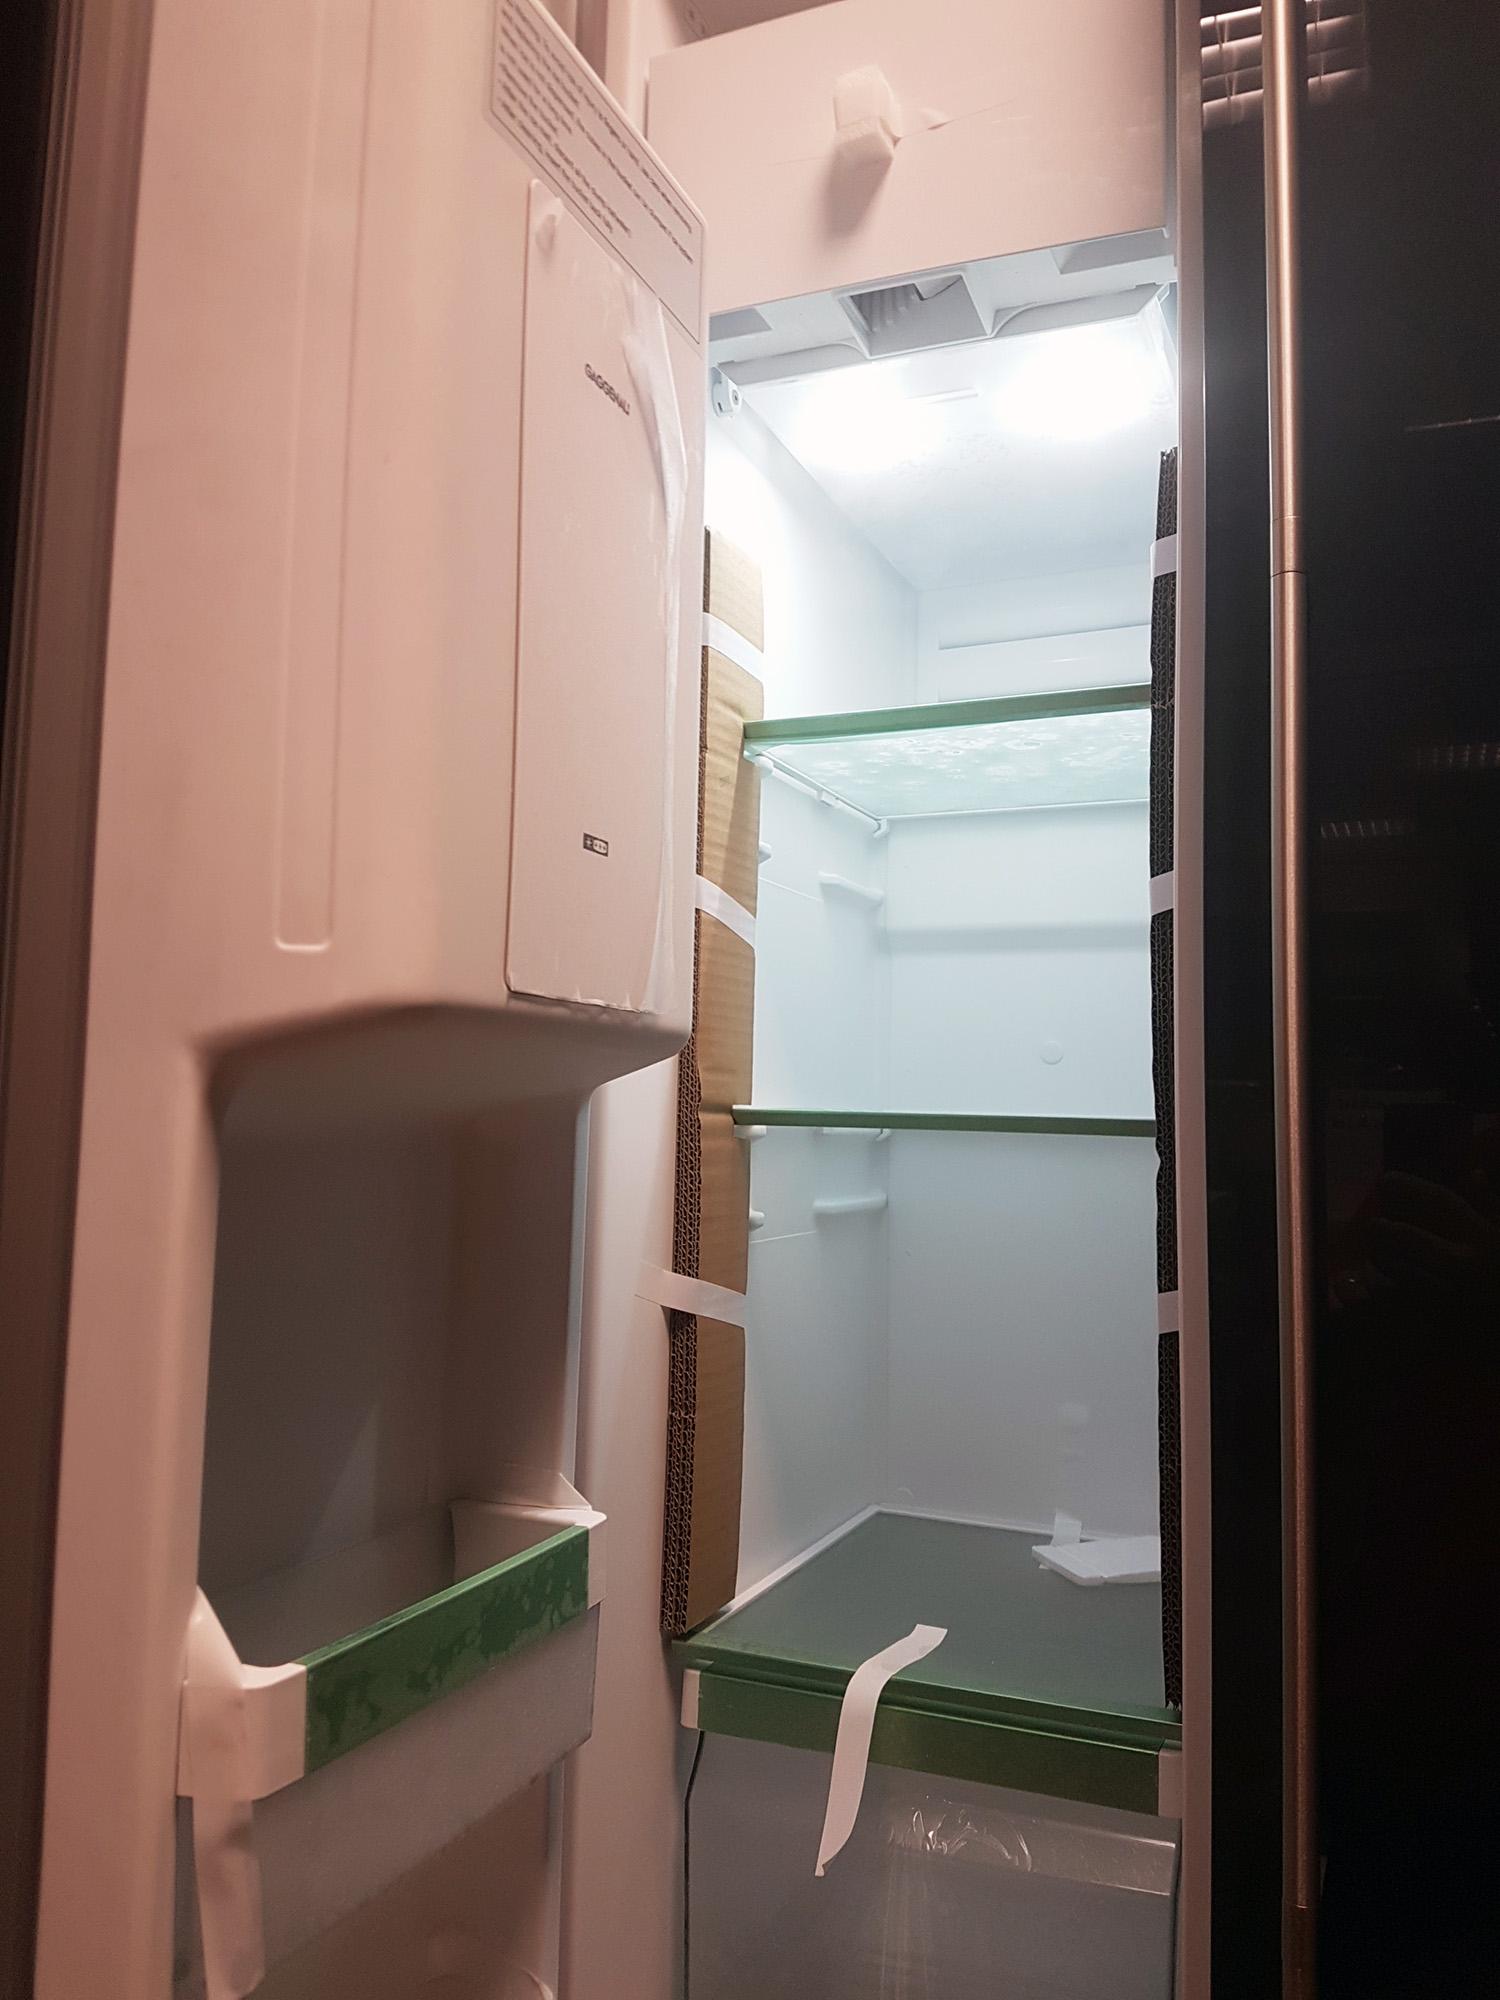 Refrigerateur Americain Faible Largeur sideside gaggenau rs 295